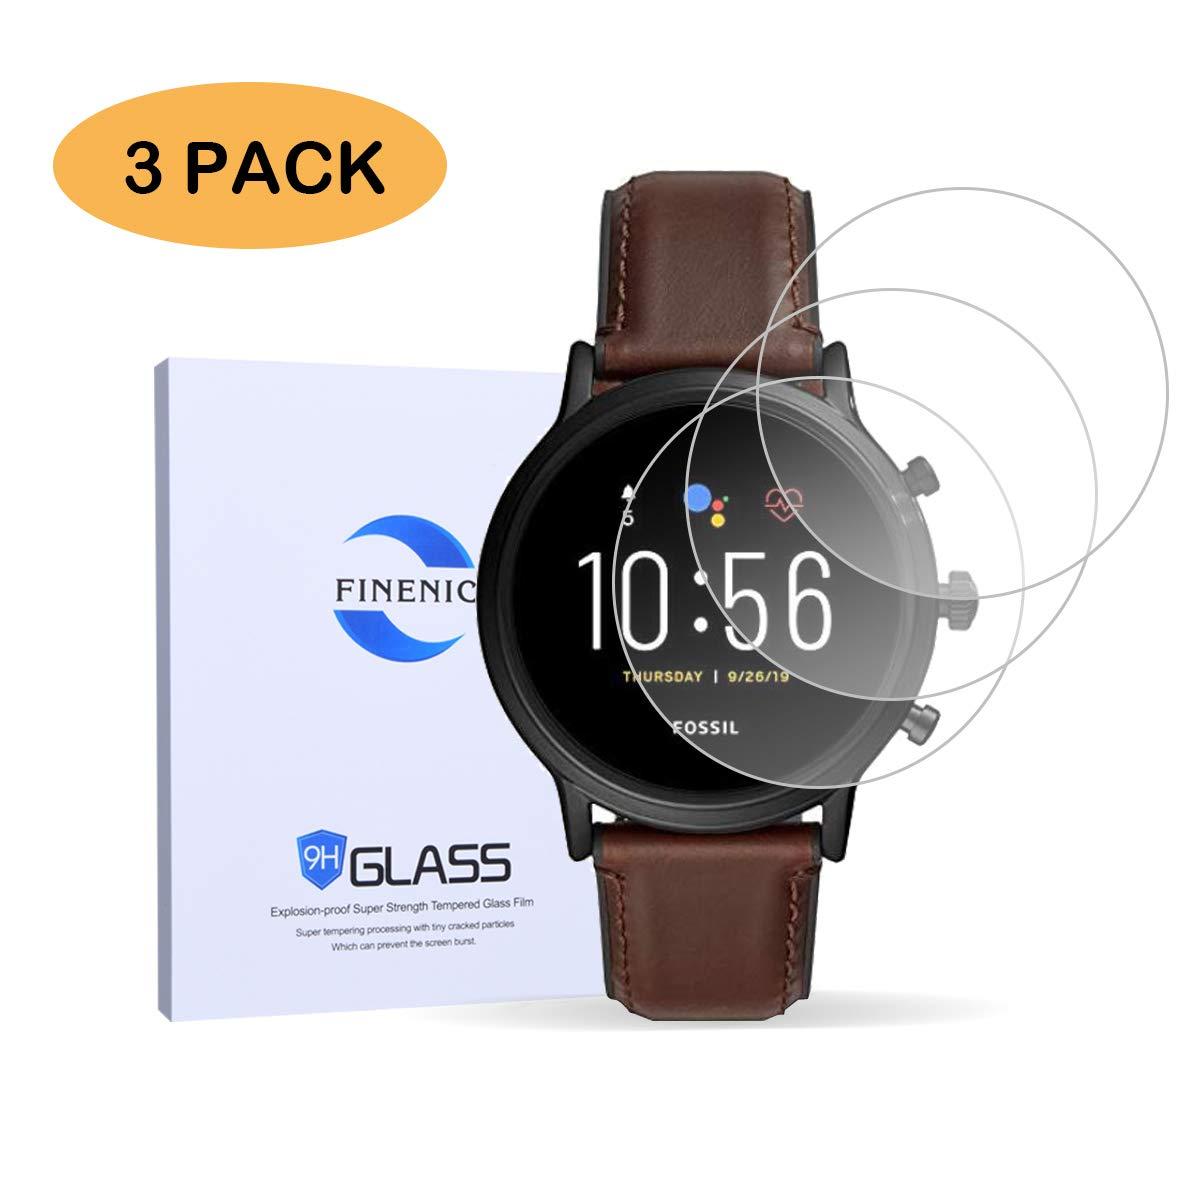 FINENIC Fossil Gen 5 Carlyle HR Smartwatch Tempered Glass Screen Protector 【37.5mm Diameter】【3 PCS】